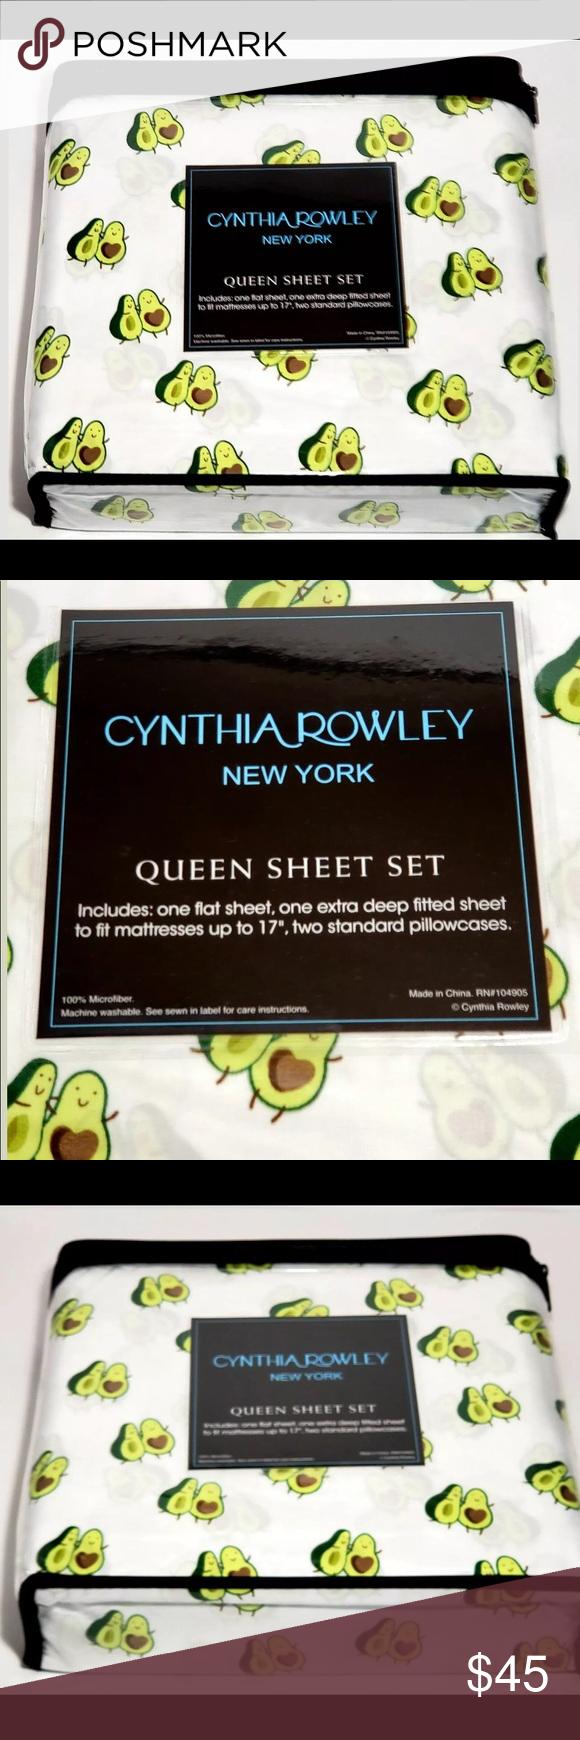 AVOCADO DANCE TWO STANDARD PILLOWCASES NWT BY CYNTHIA ROWLEY NEW YORK